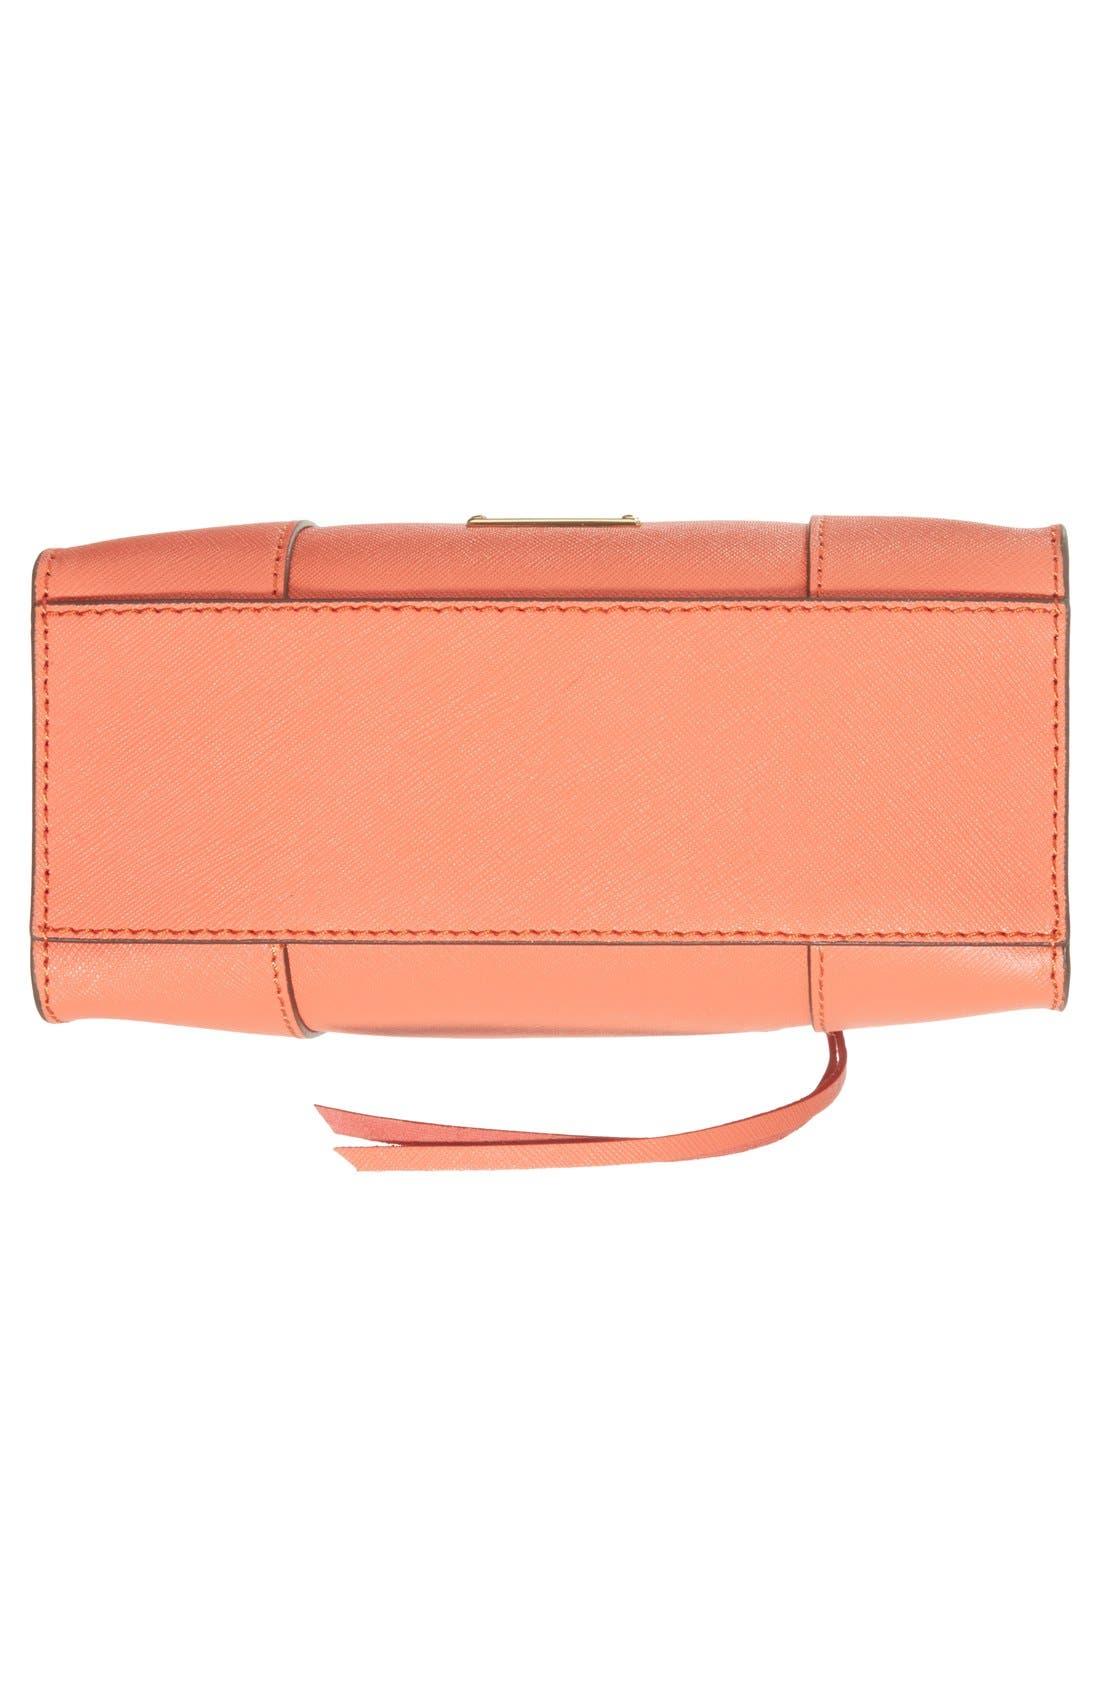 ,                             'Mini MAB Tote' Crossbody Bag,                             Alternate thumbnail 138, color,                             801